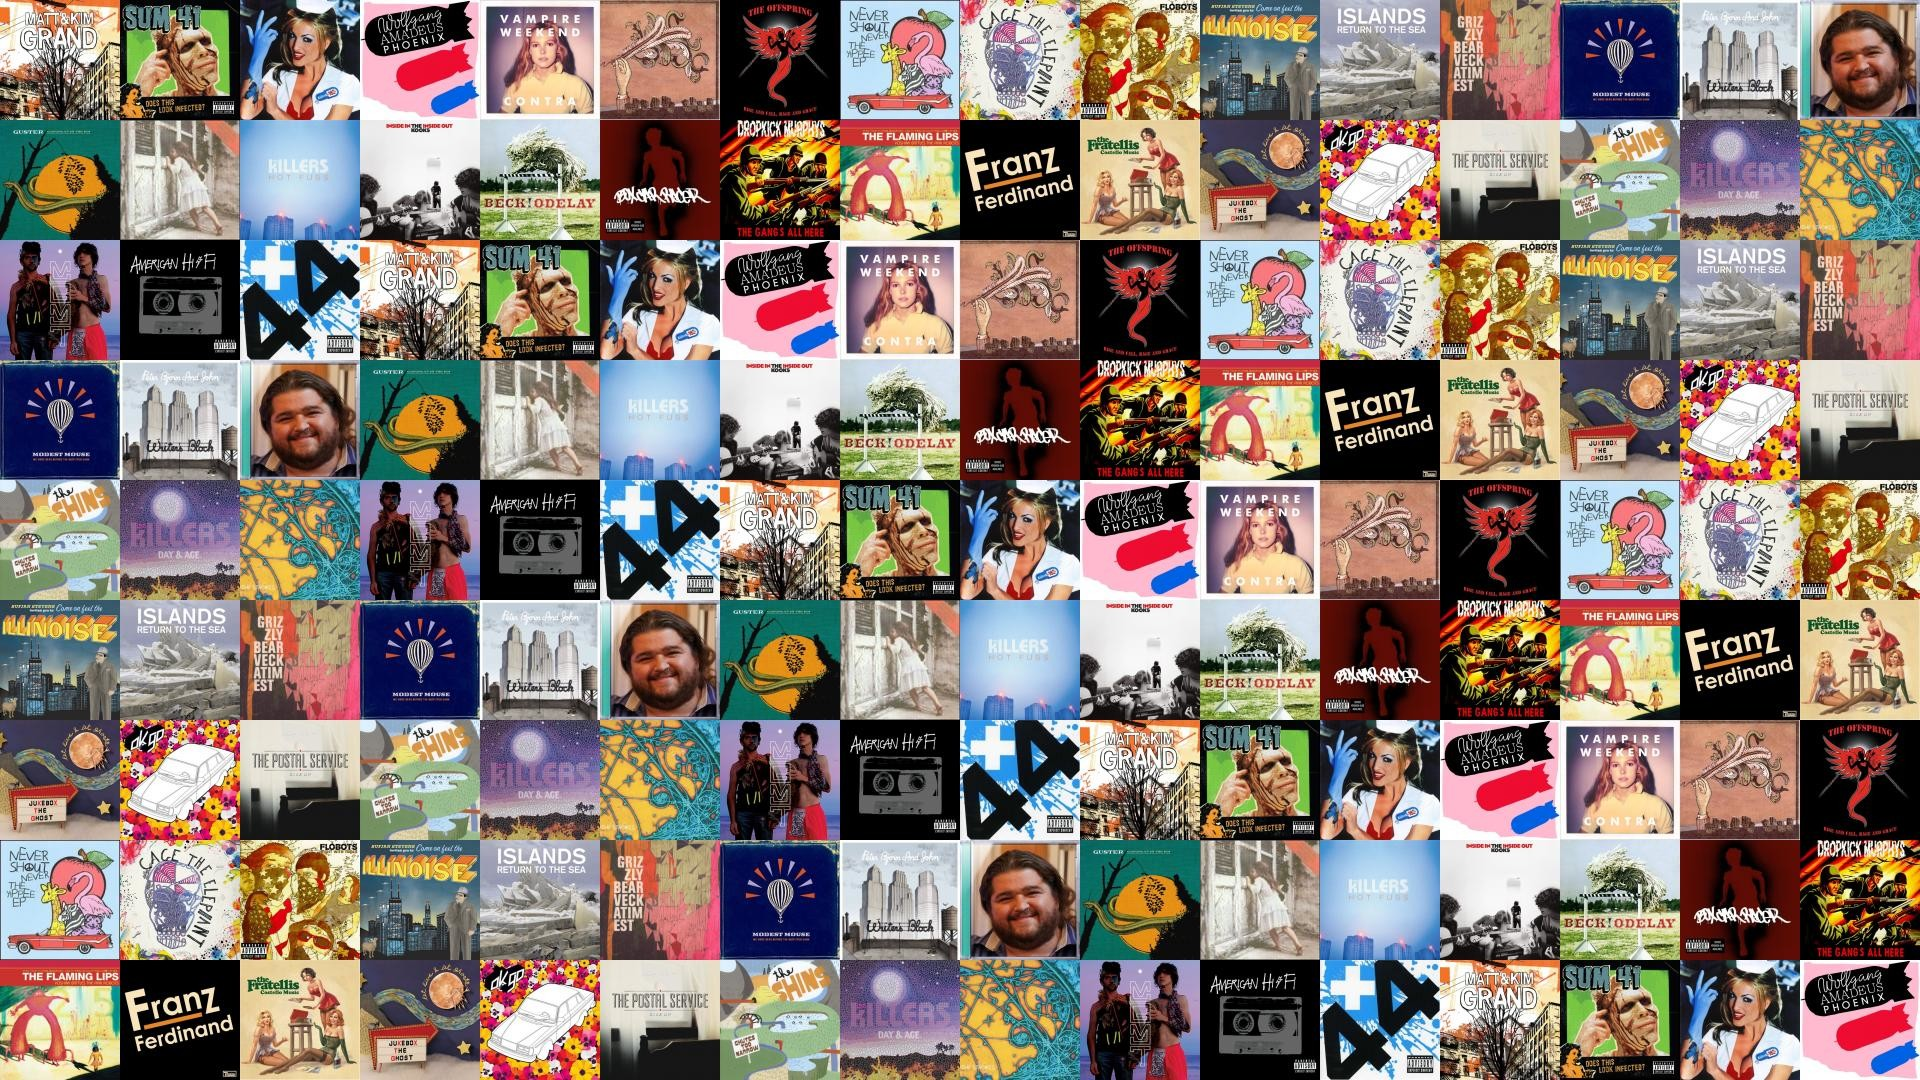 Matt Kim Grand Sum 41 Does This Look Wallpaper Â« Tiled Desktop Wallpaper